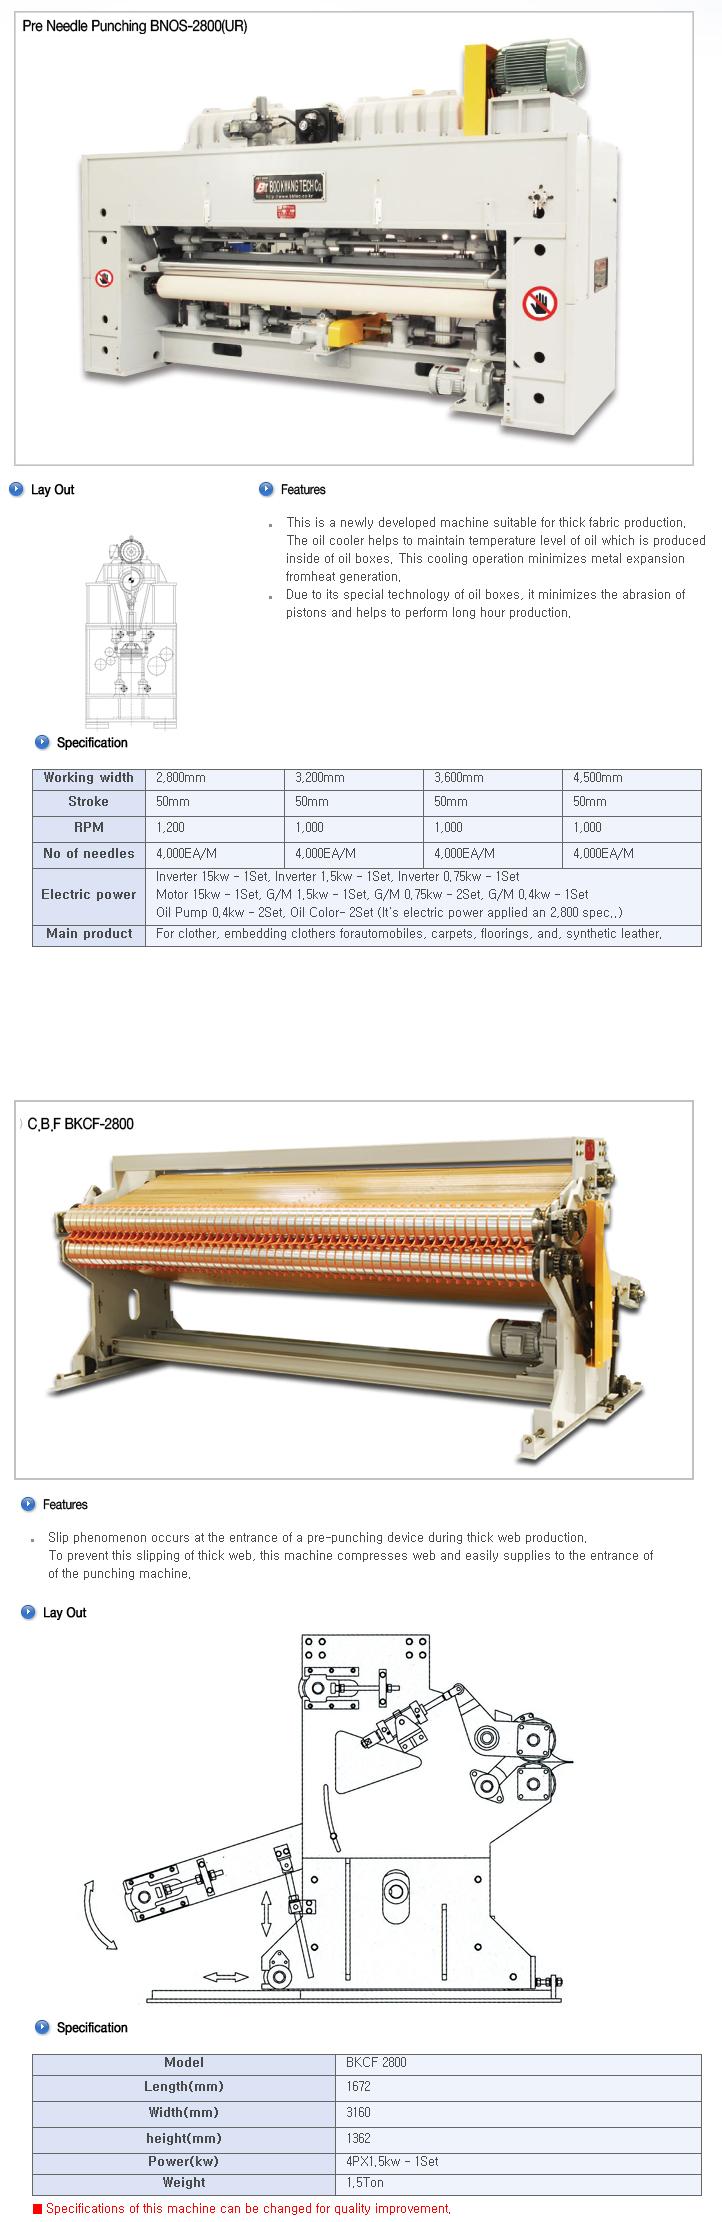 BOOKWANG TECH Pre Needle Punching Machine BNOS-2800 (UR) / BKCF-2800